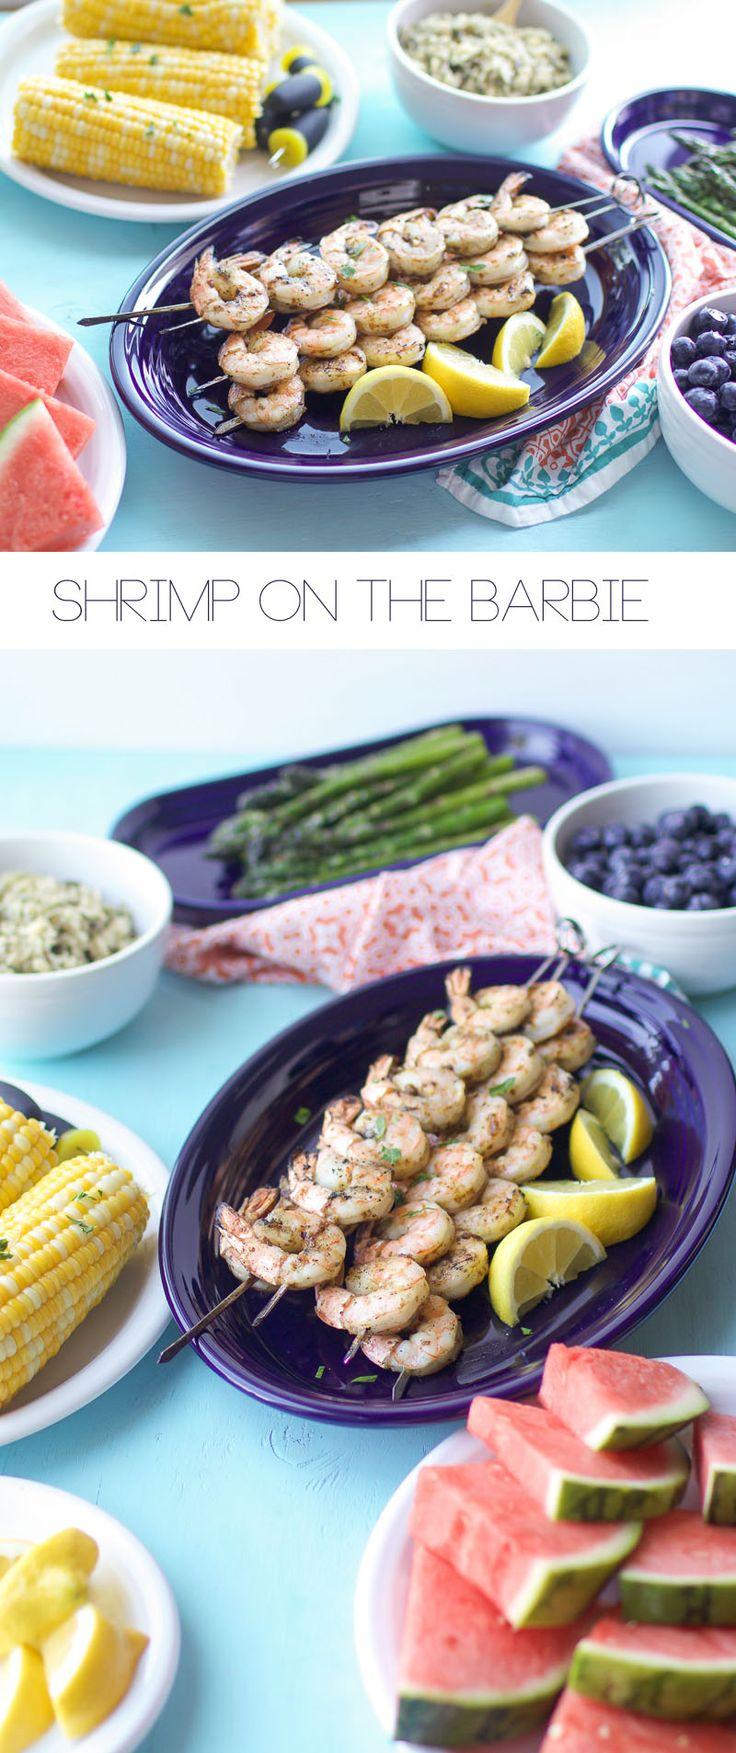 Itsr a goddamn 'prawn' On The Barbie Collage. ...no true Australian calls it a shrimp, let alone puts a 'prawn' on the barbie when there is steak around!❤